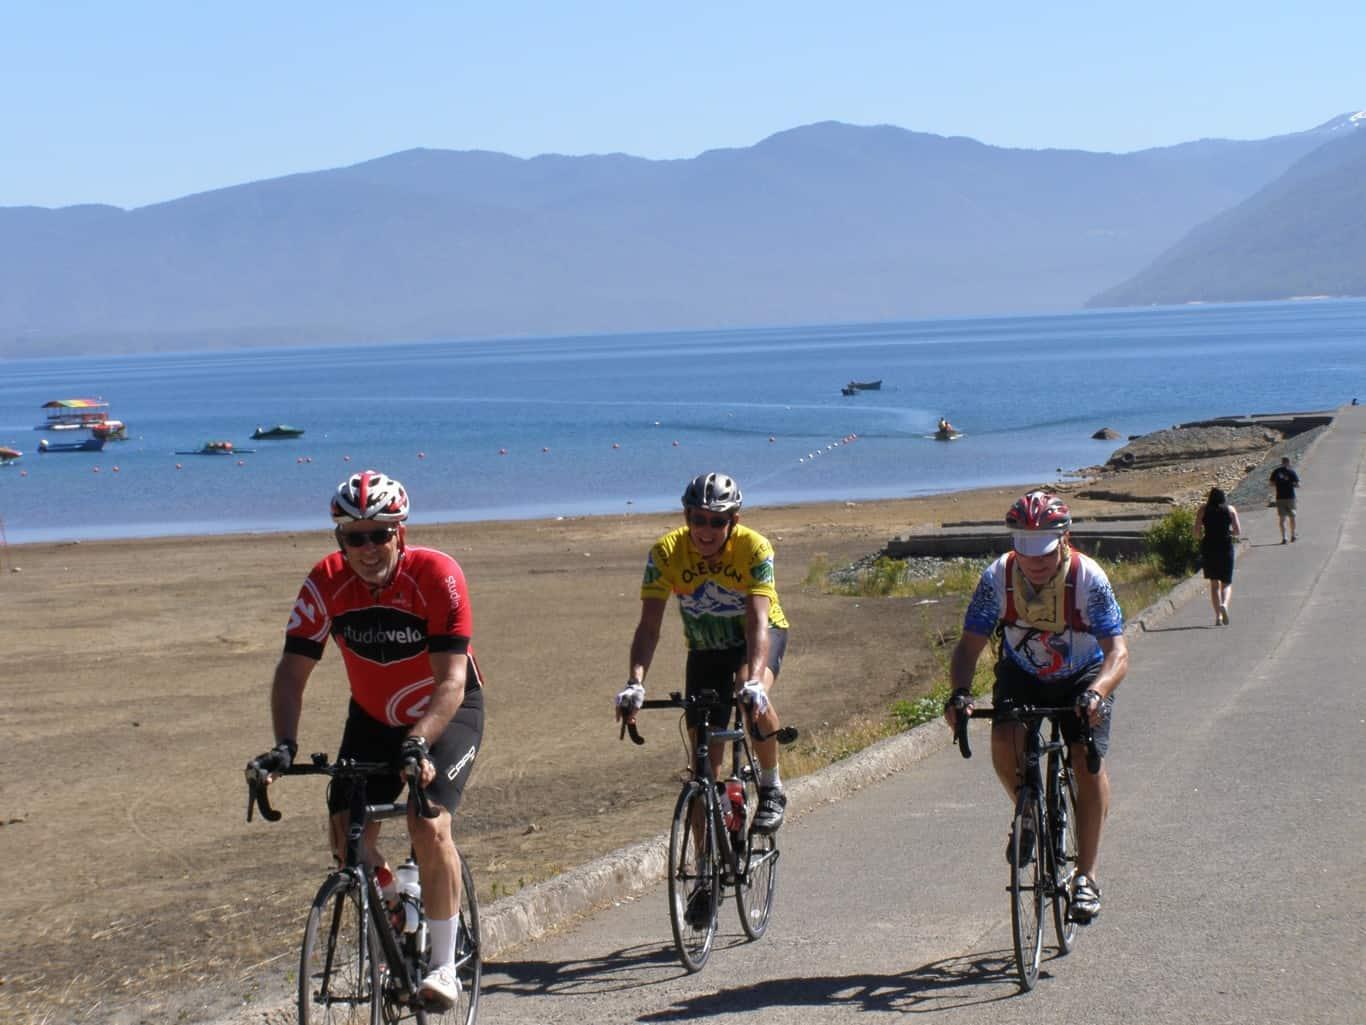 Day 4 - Pucón - Caburgua Lake Ride